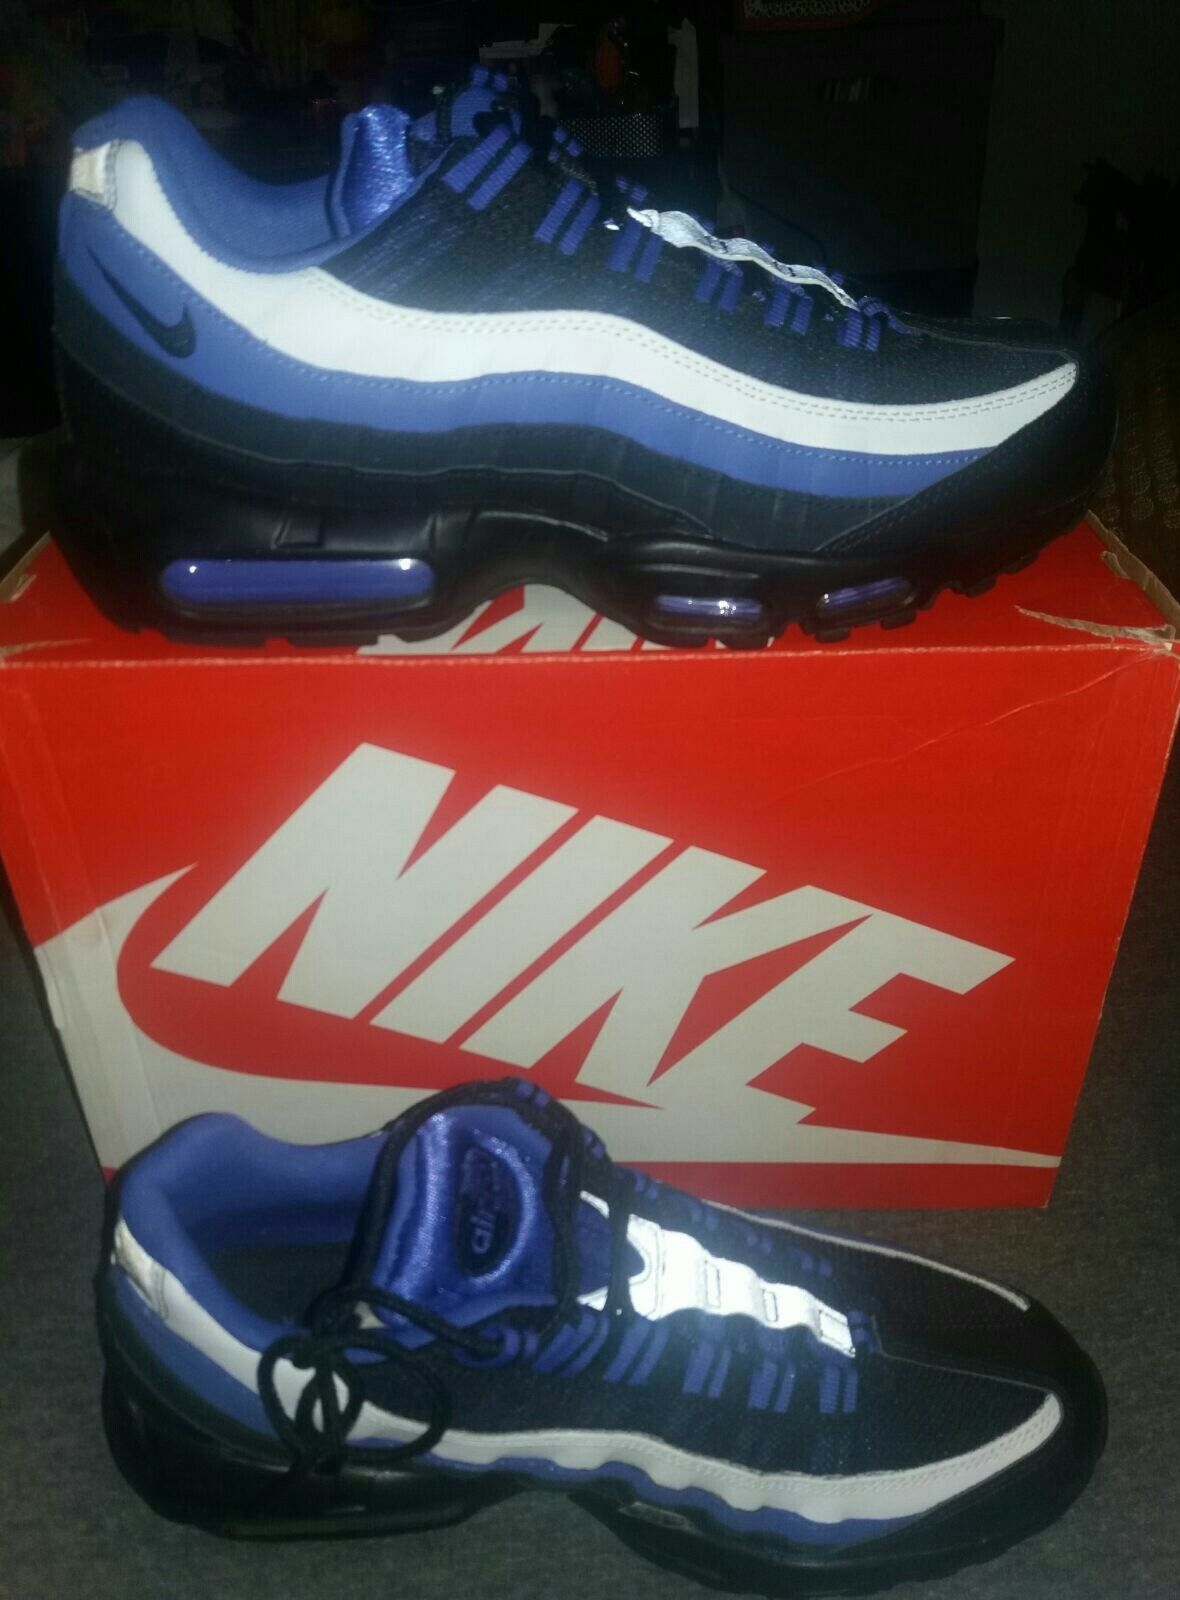 Nike Air Max 95 Running Trainers Trainers Trainers scarpe 3M Performance Athletic scarpe da ginnastica blu 9.5 7fc13f